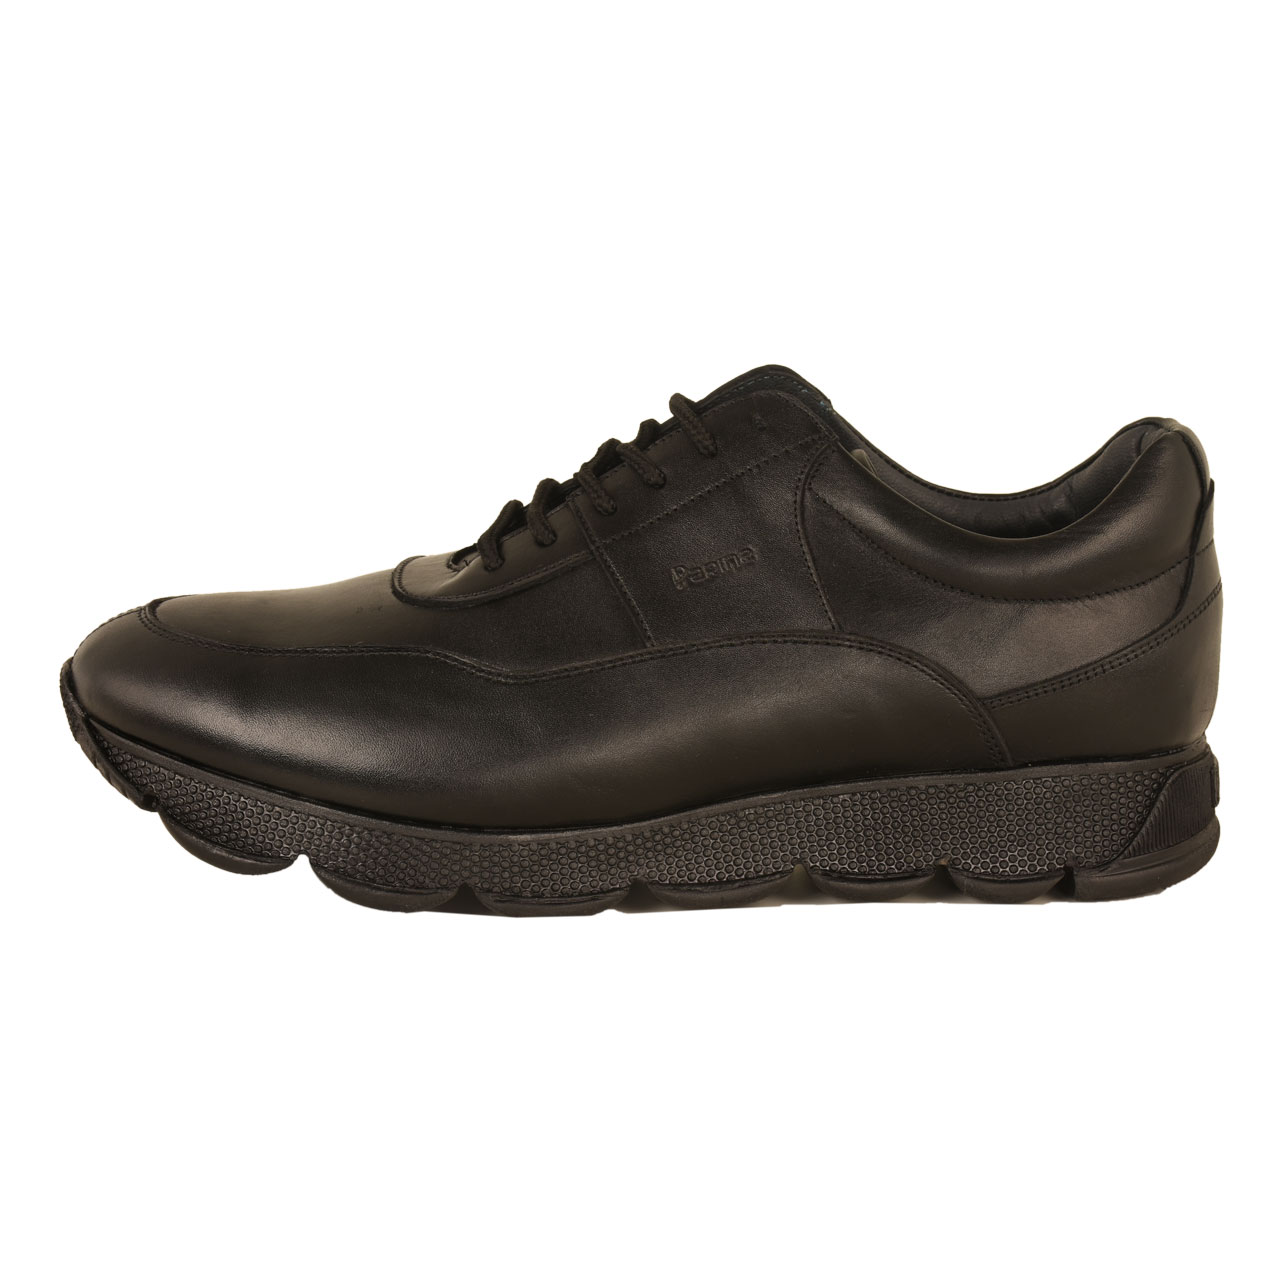 قیمت کفش مردانه پارینه مدل SHO149